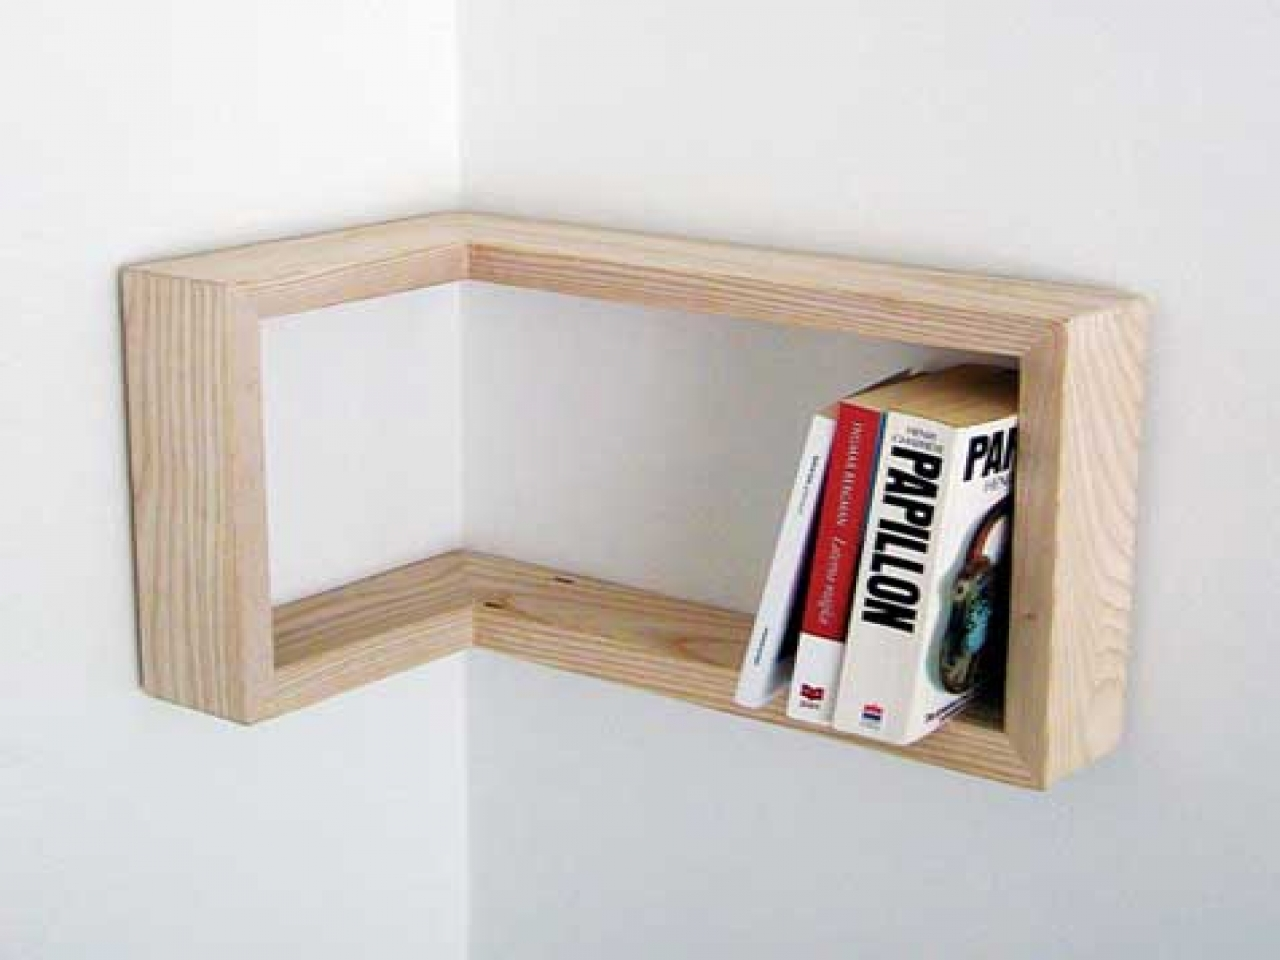 Smothery Home Bookshelf Designs Home Ways To Diy Shelves Wall Shelf Designs home decor Shelf Designs For Home